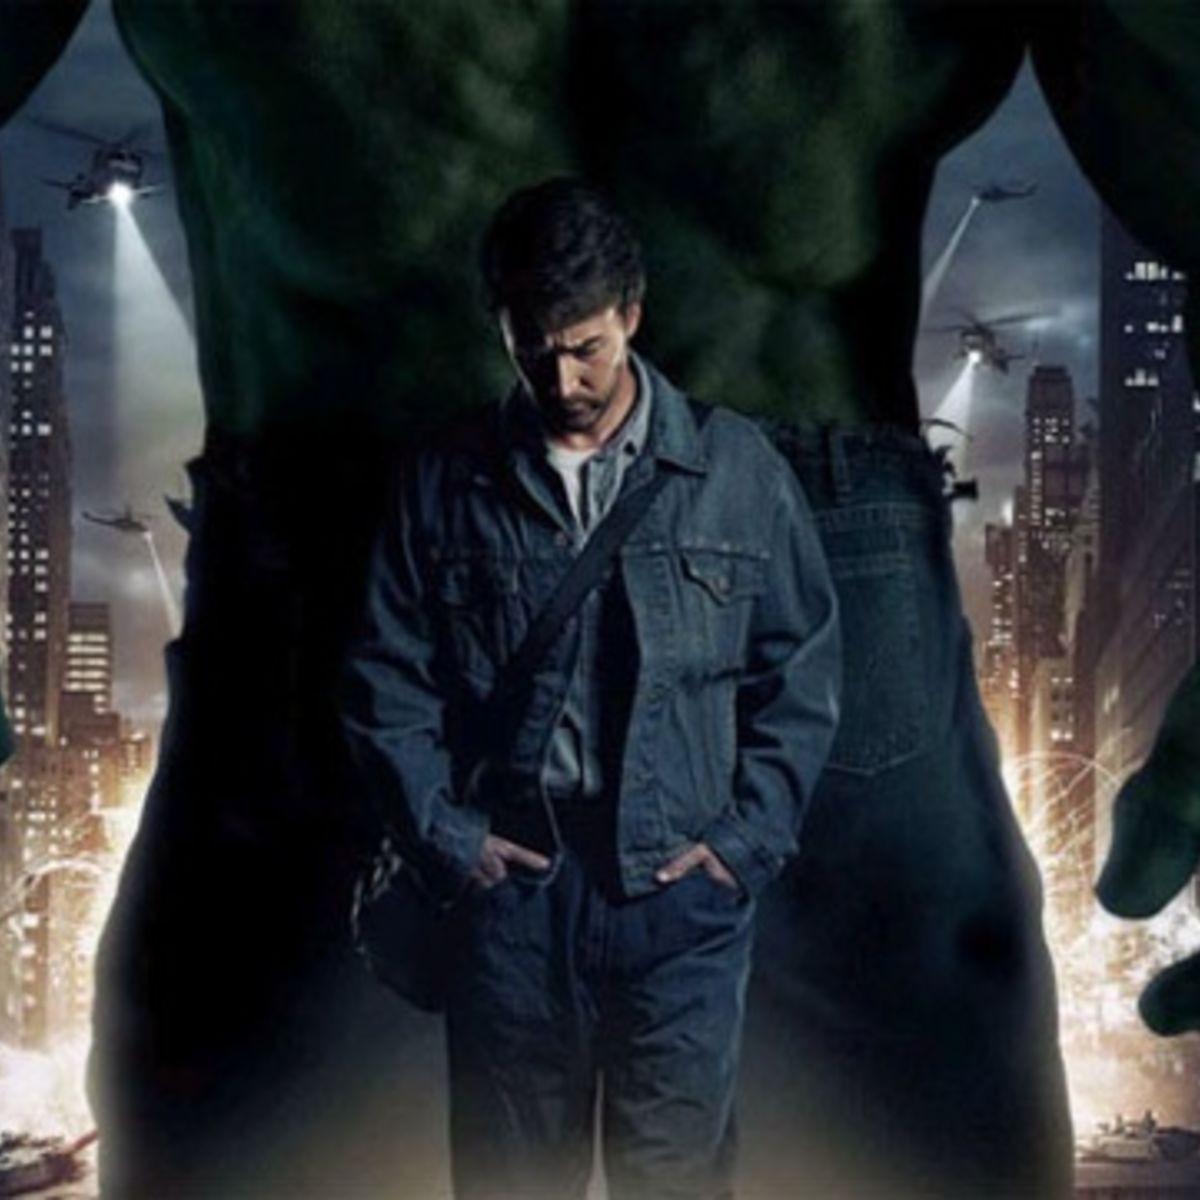 edward_norton_hulk_avengers.jpg